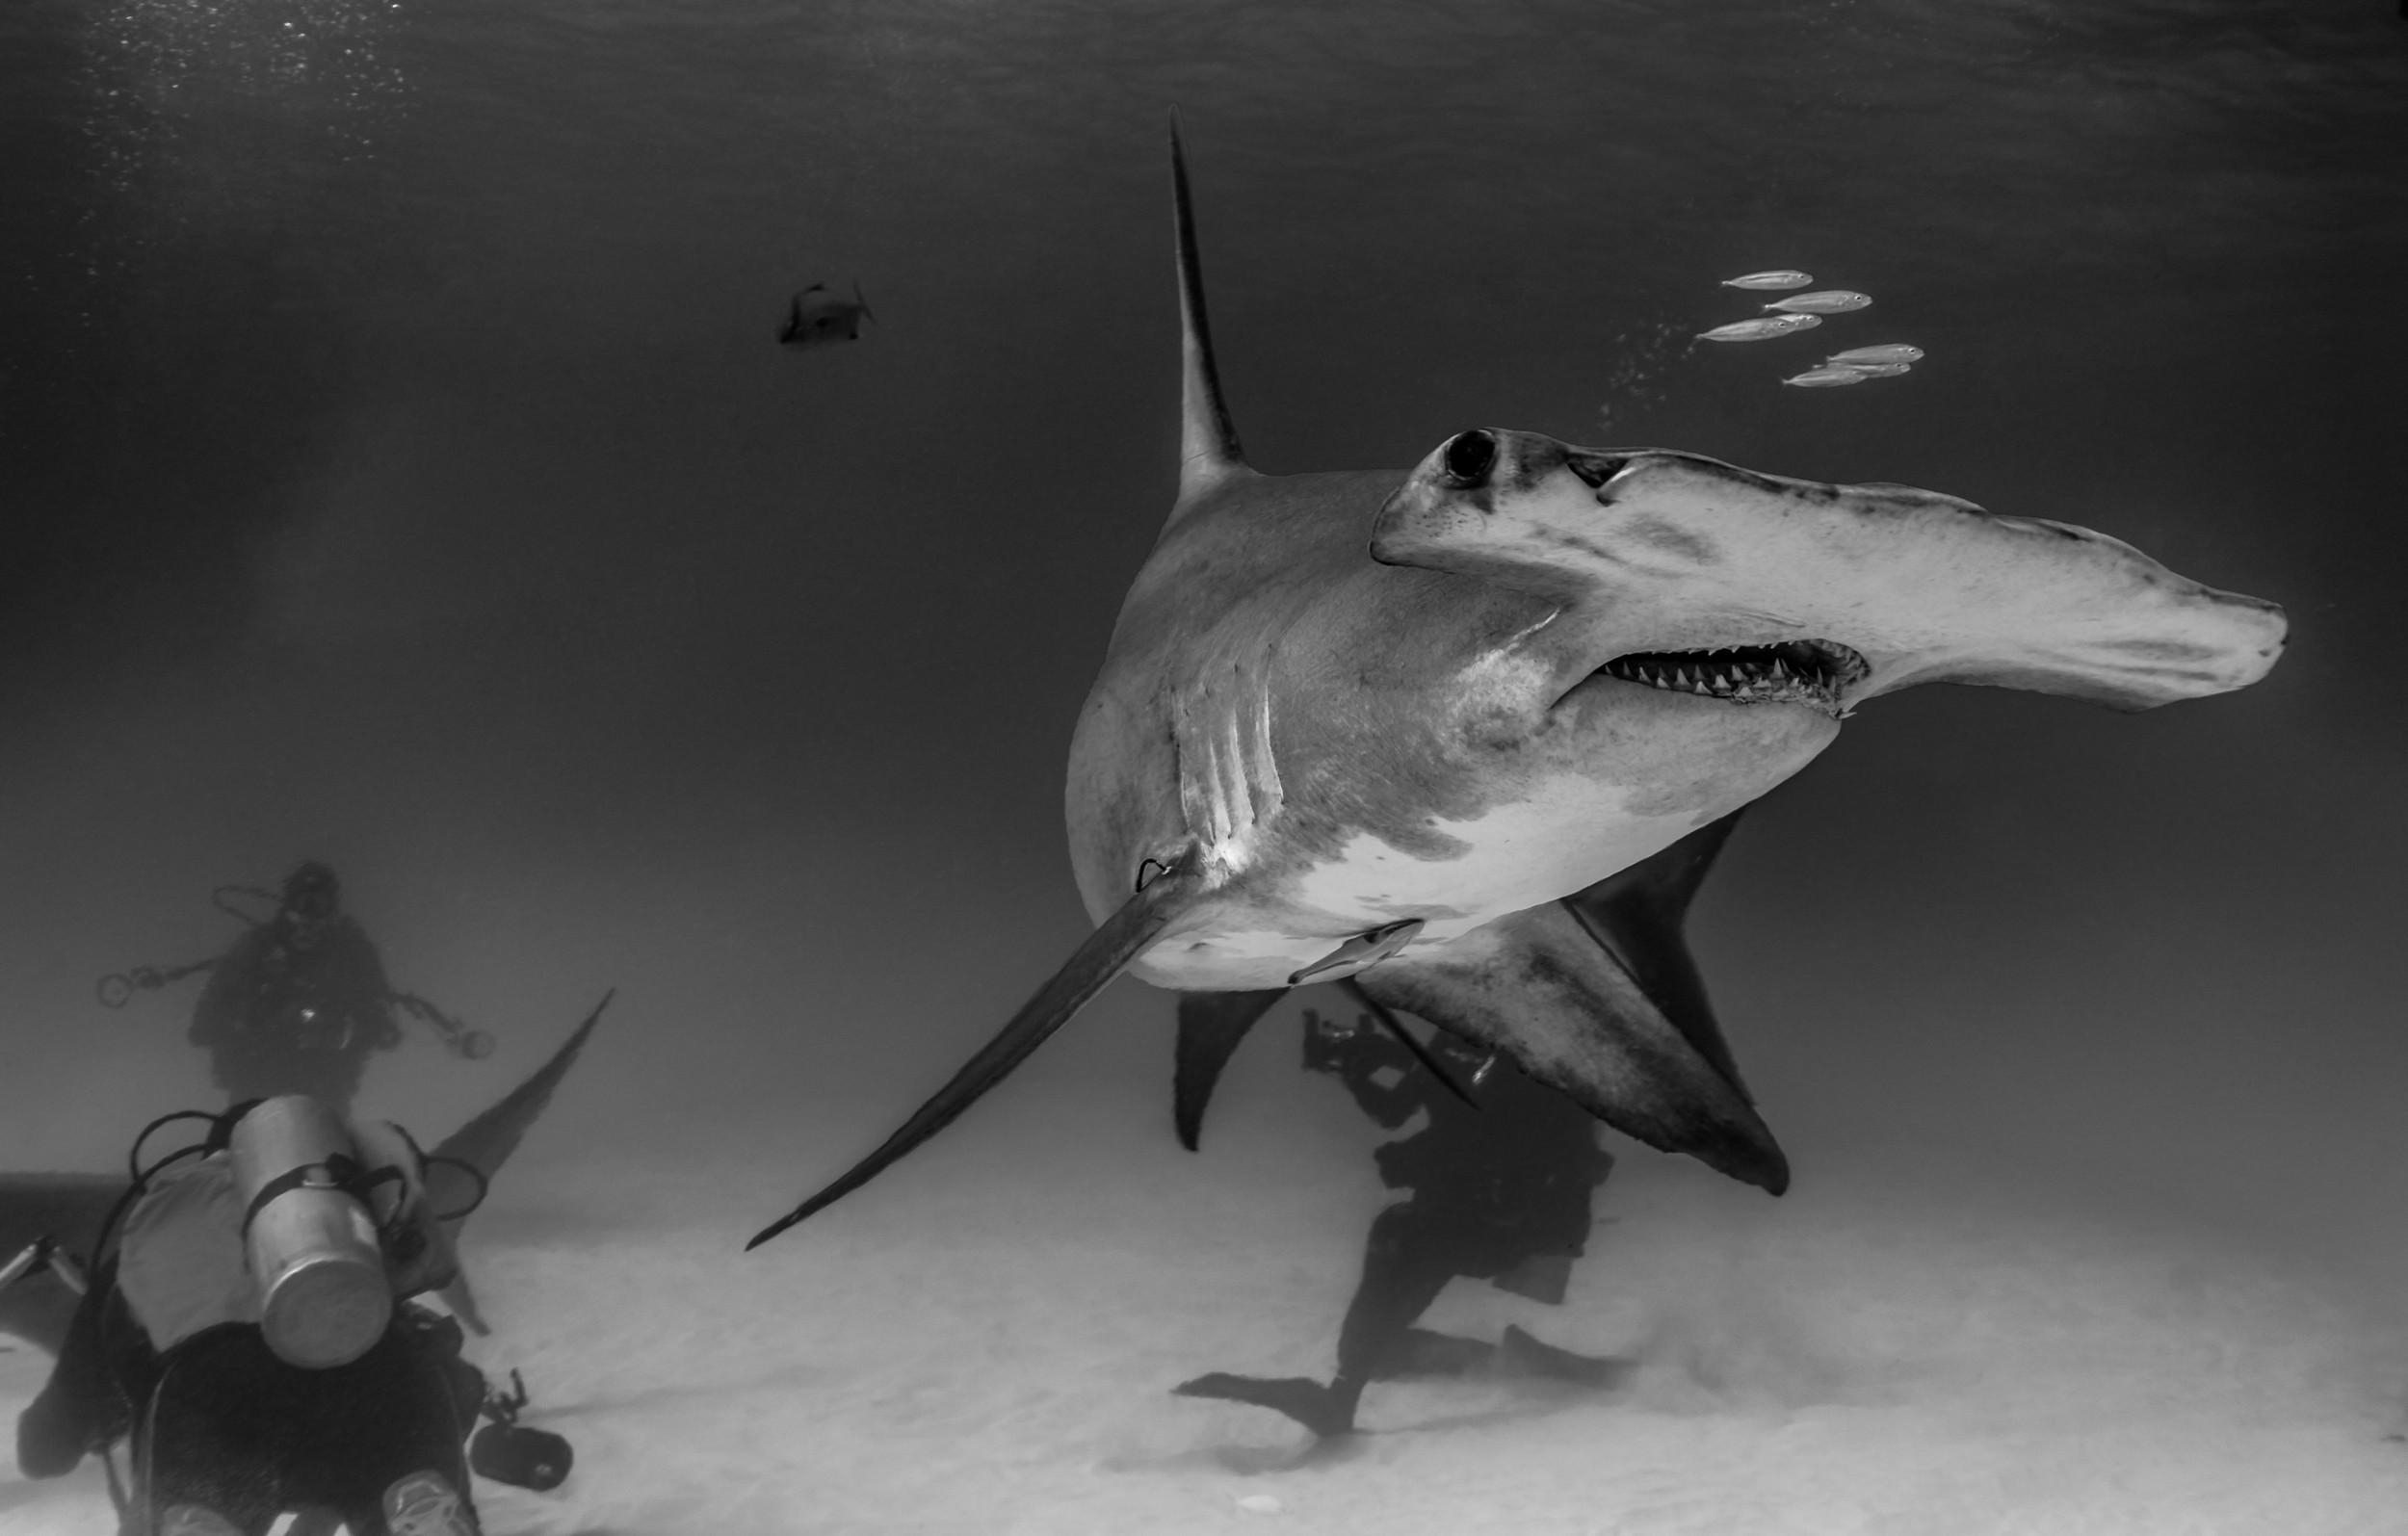 Great Hammerhead Shark (Sphyrna mokorran) - BW Hammer and friends